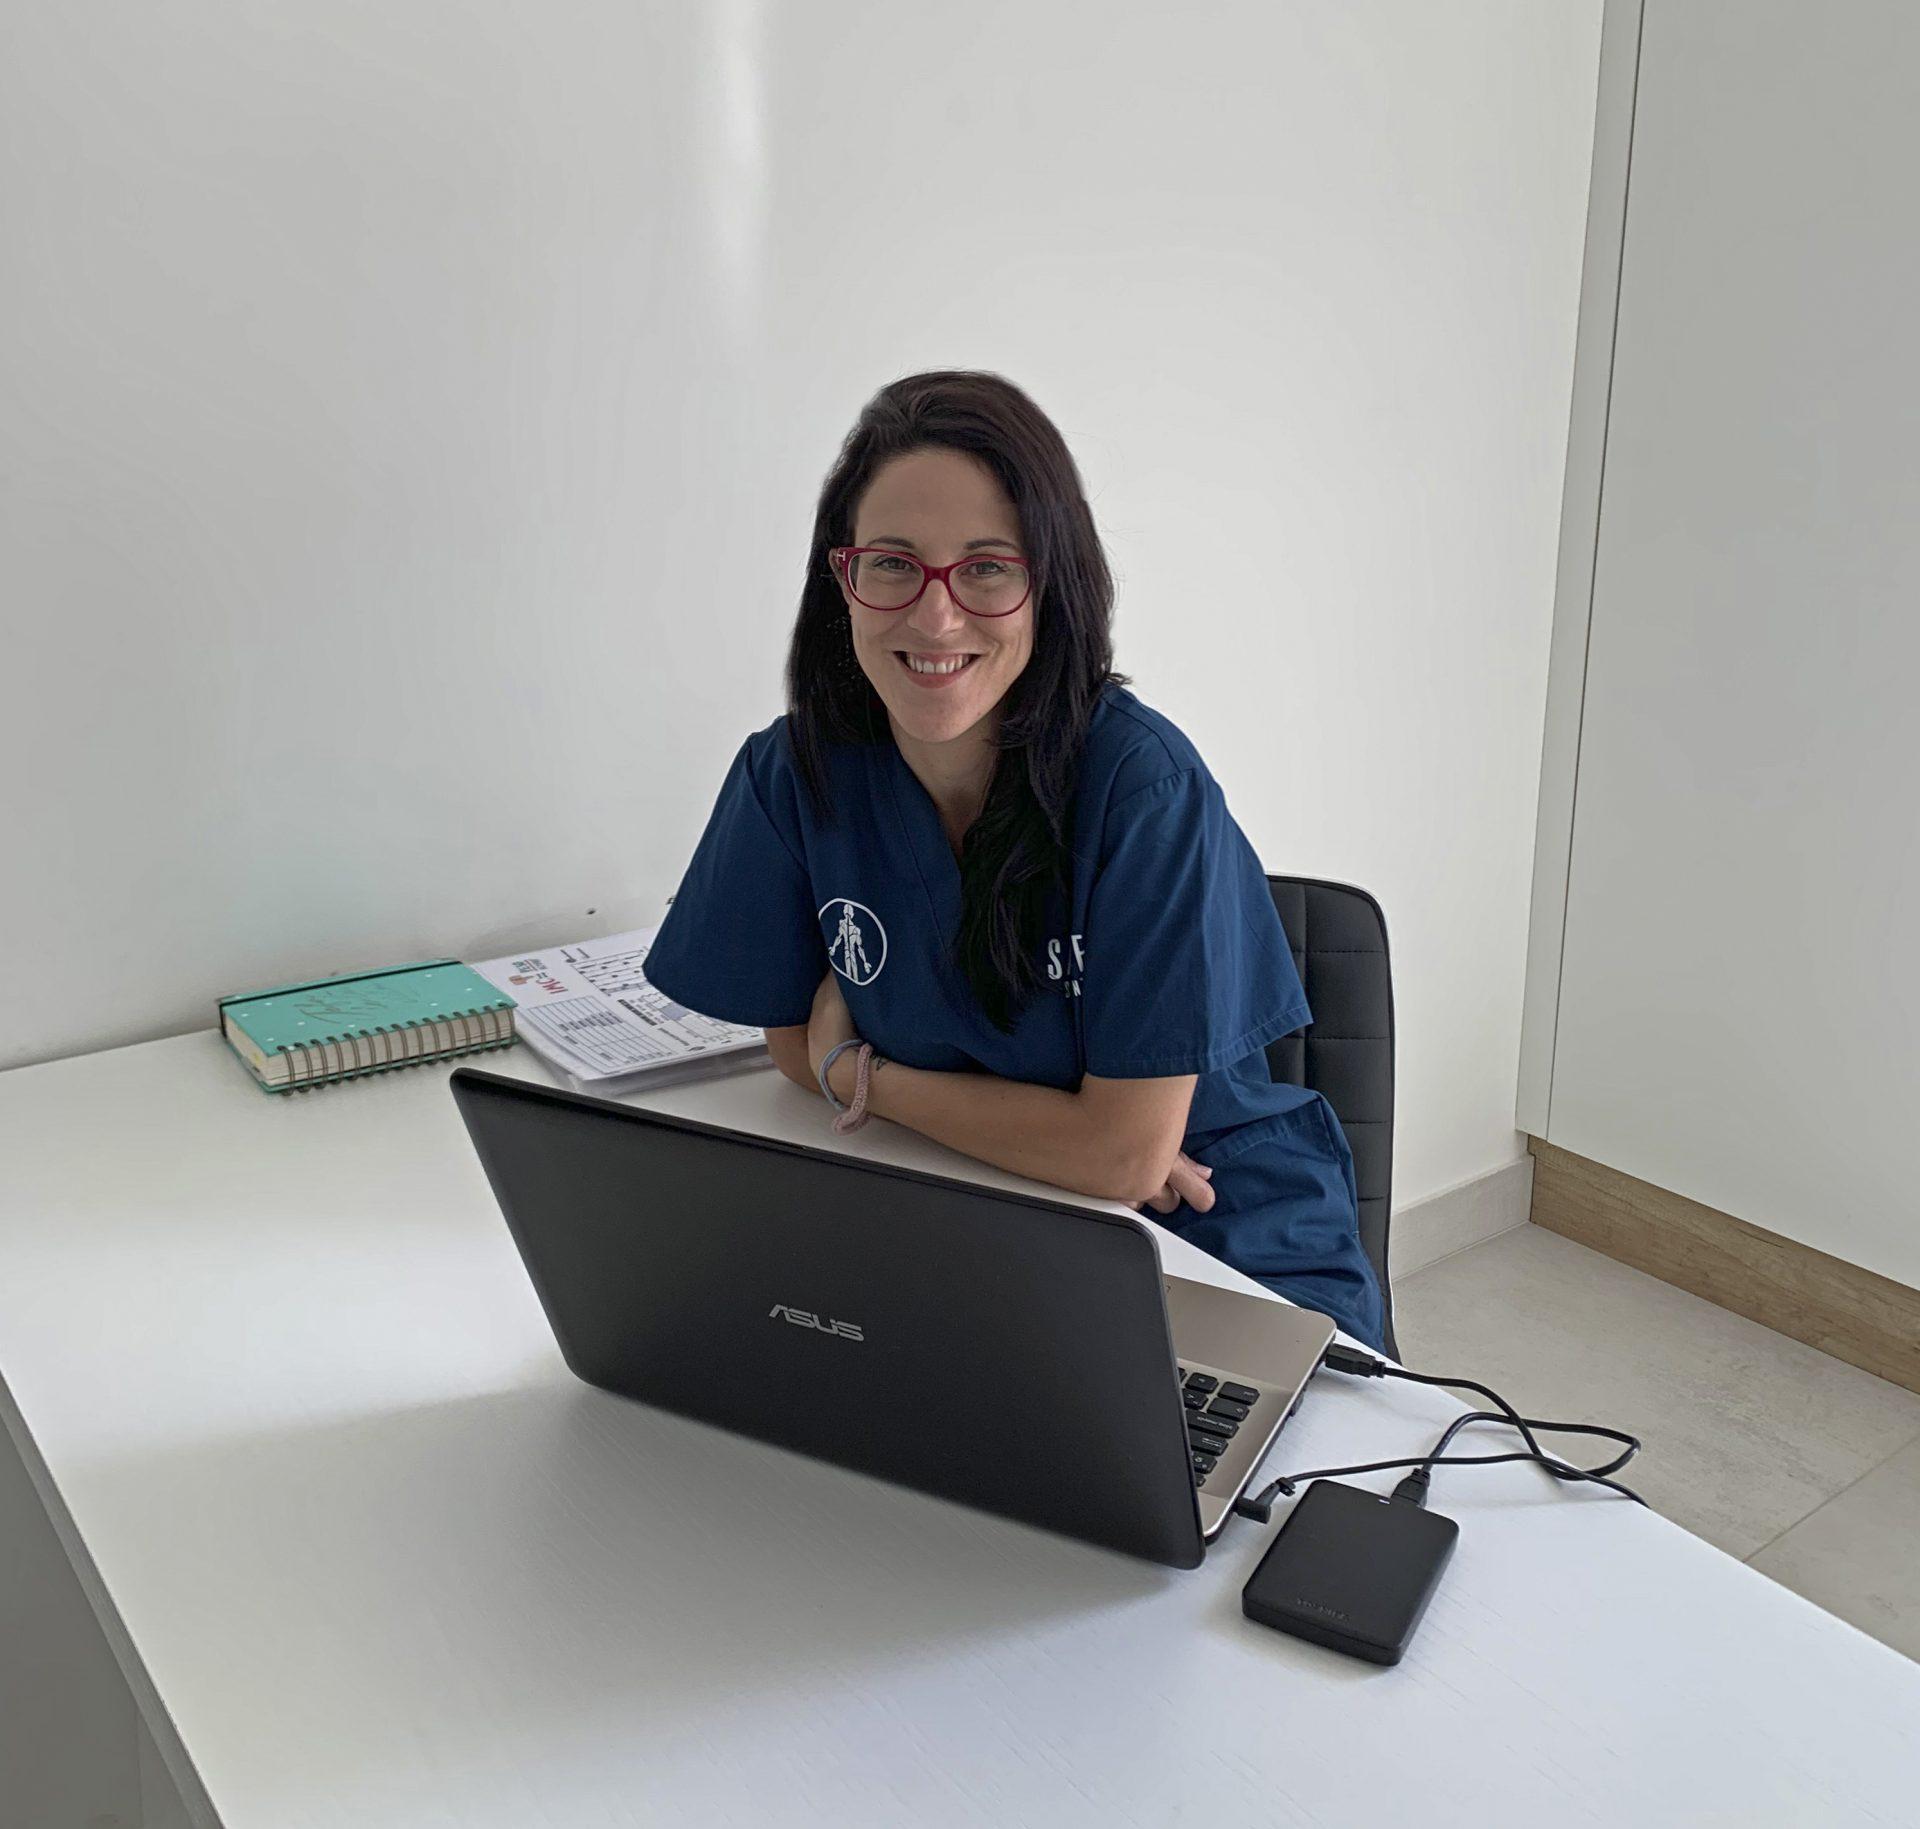 Ana Ruiz Sánchez